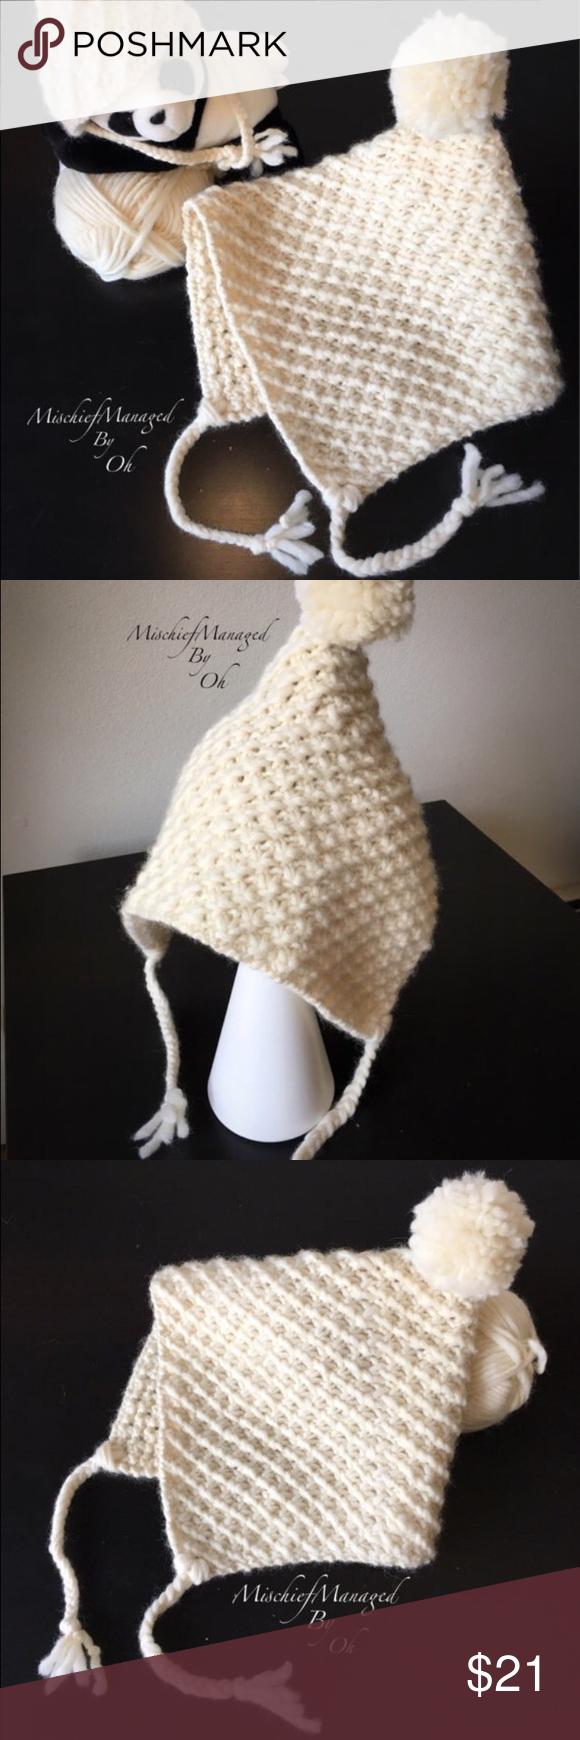 Fashion Winter Beanie Knit Ski Tassels Pom2 NWT